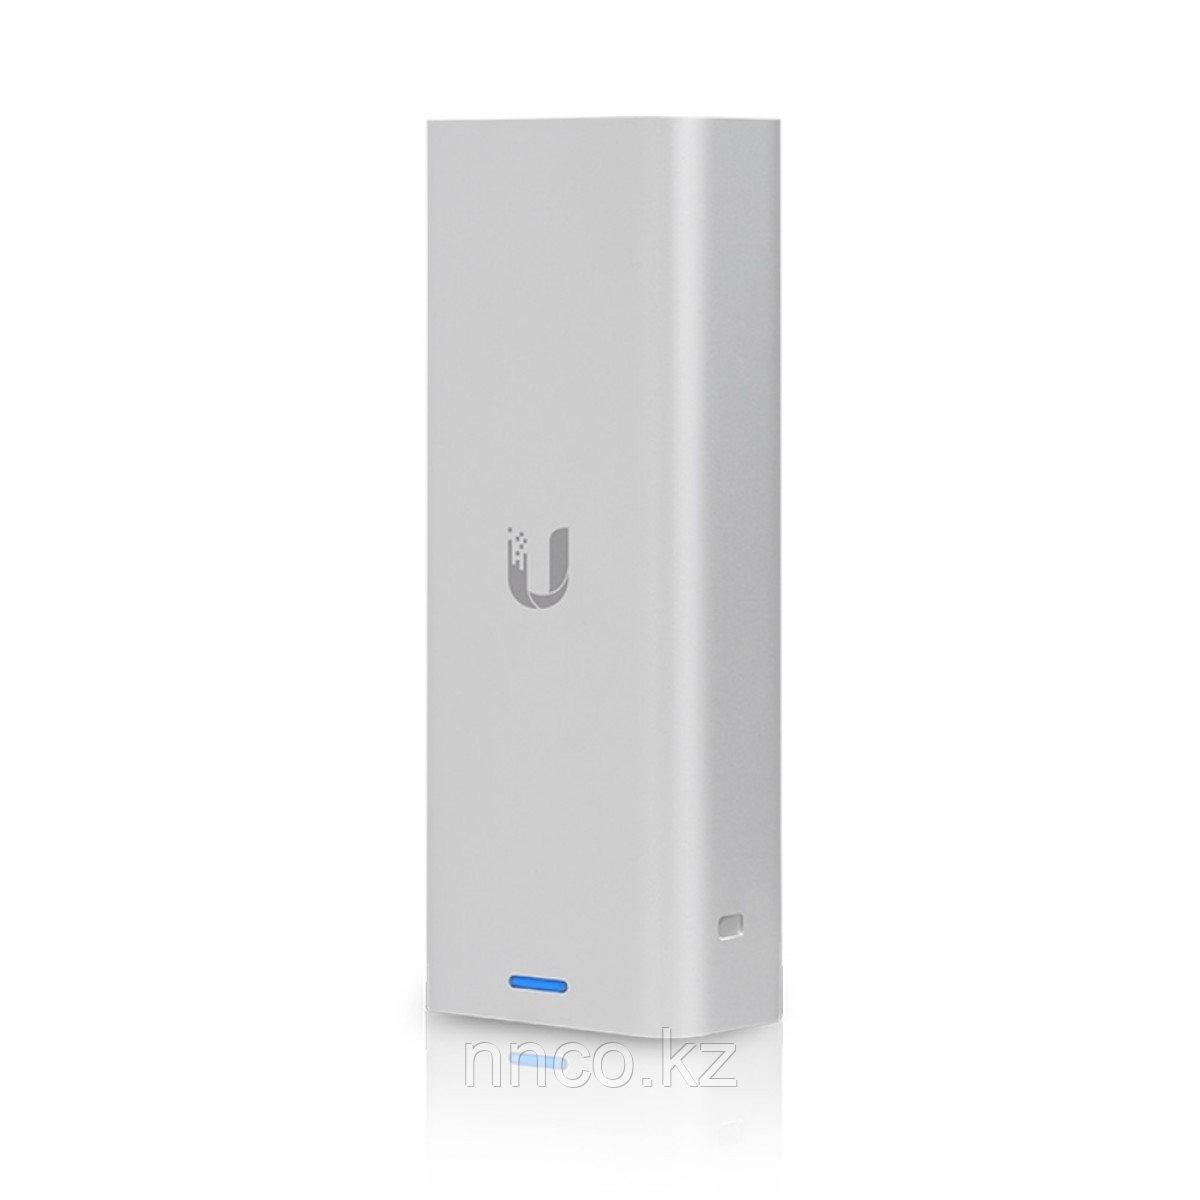 Контроллер UniFi Cloud Key Gen2